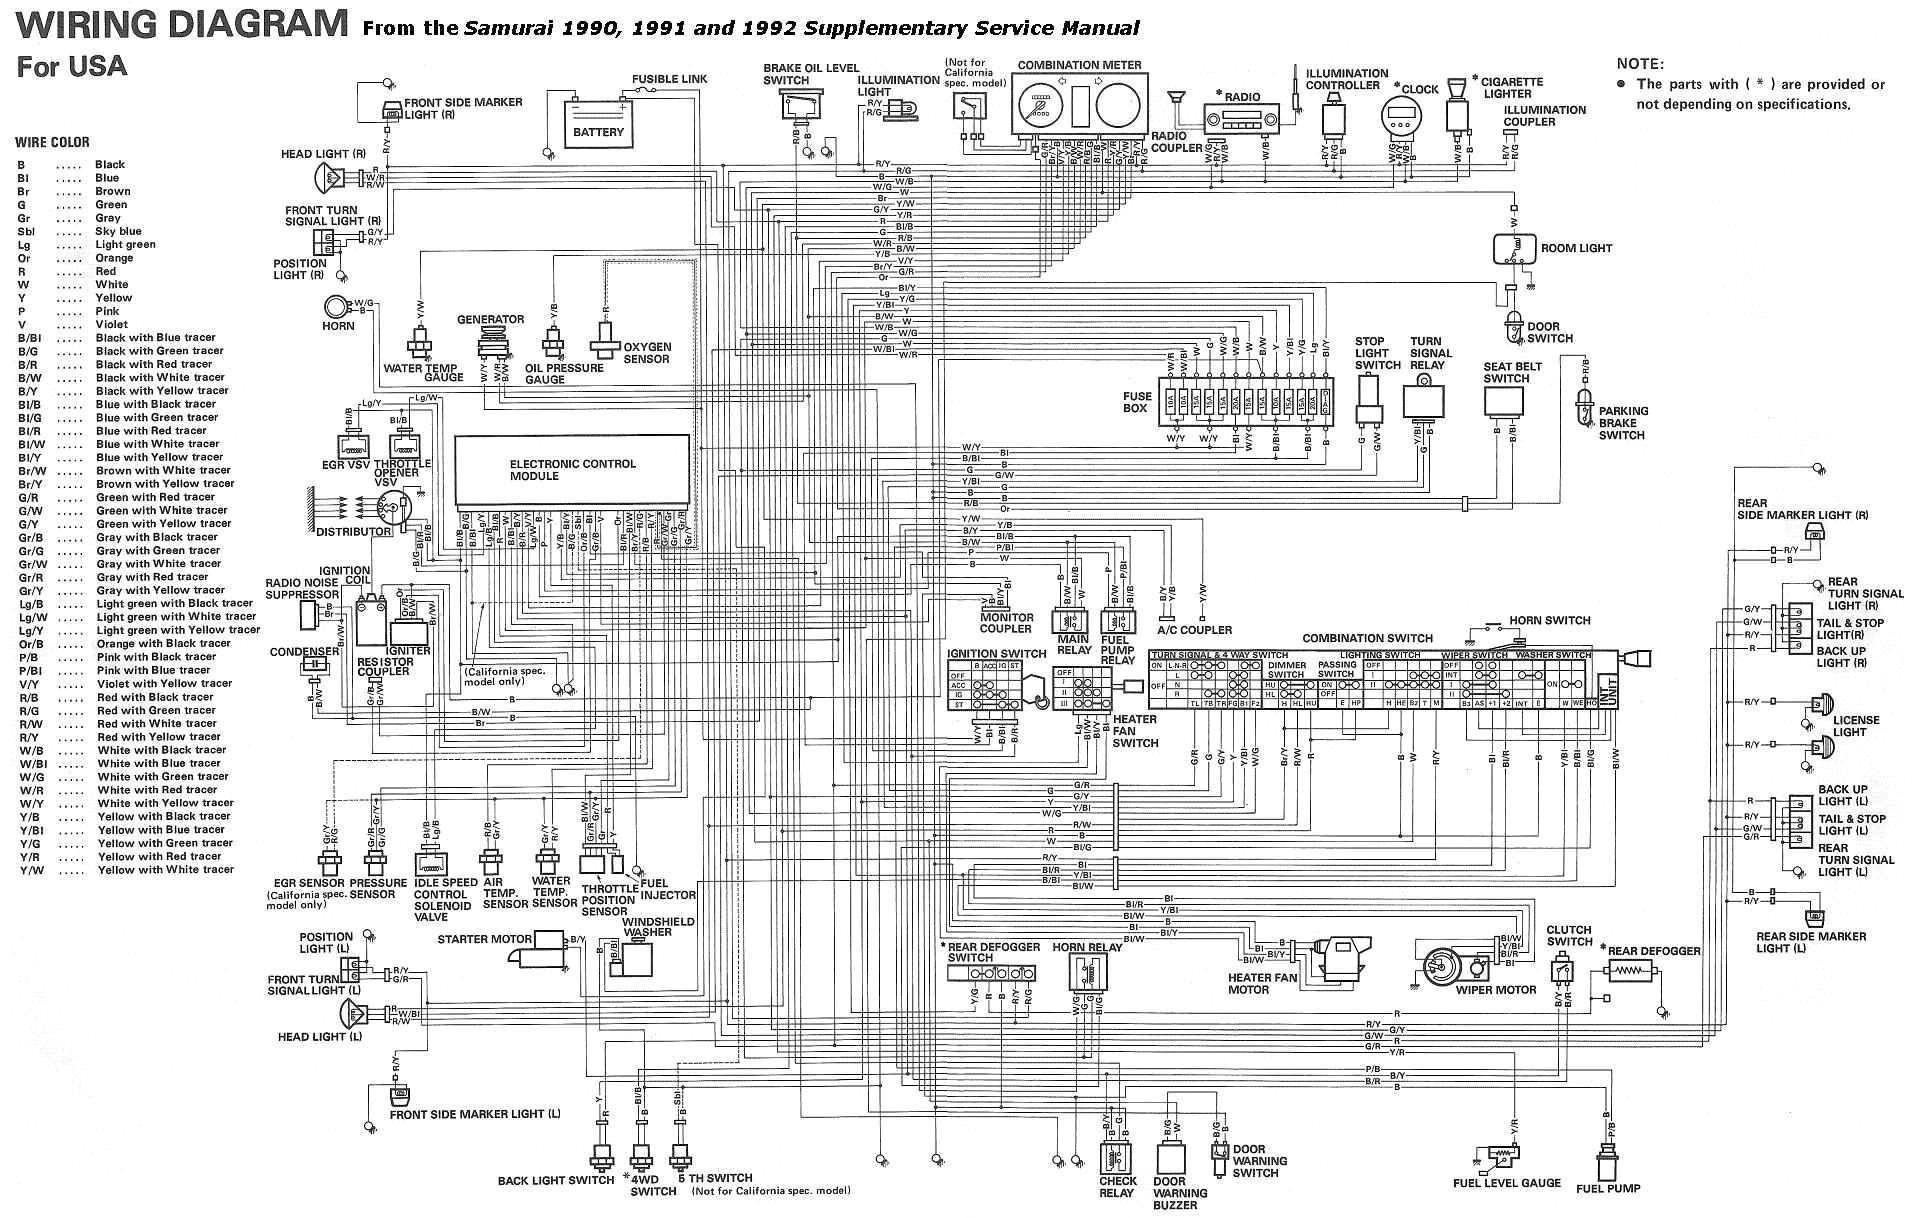 wiring diagram jimny auto diagram database suzuki engine wiring diagram wiring diagram name wiring diagram jimny